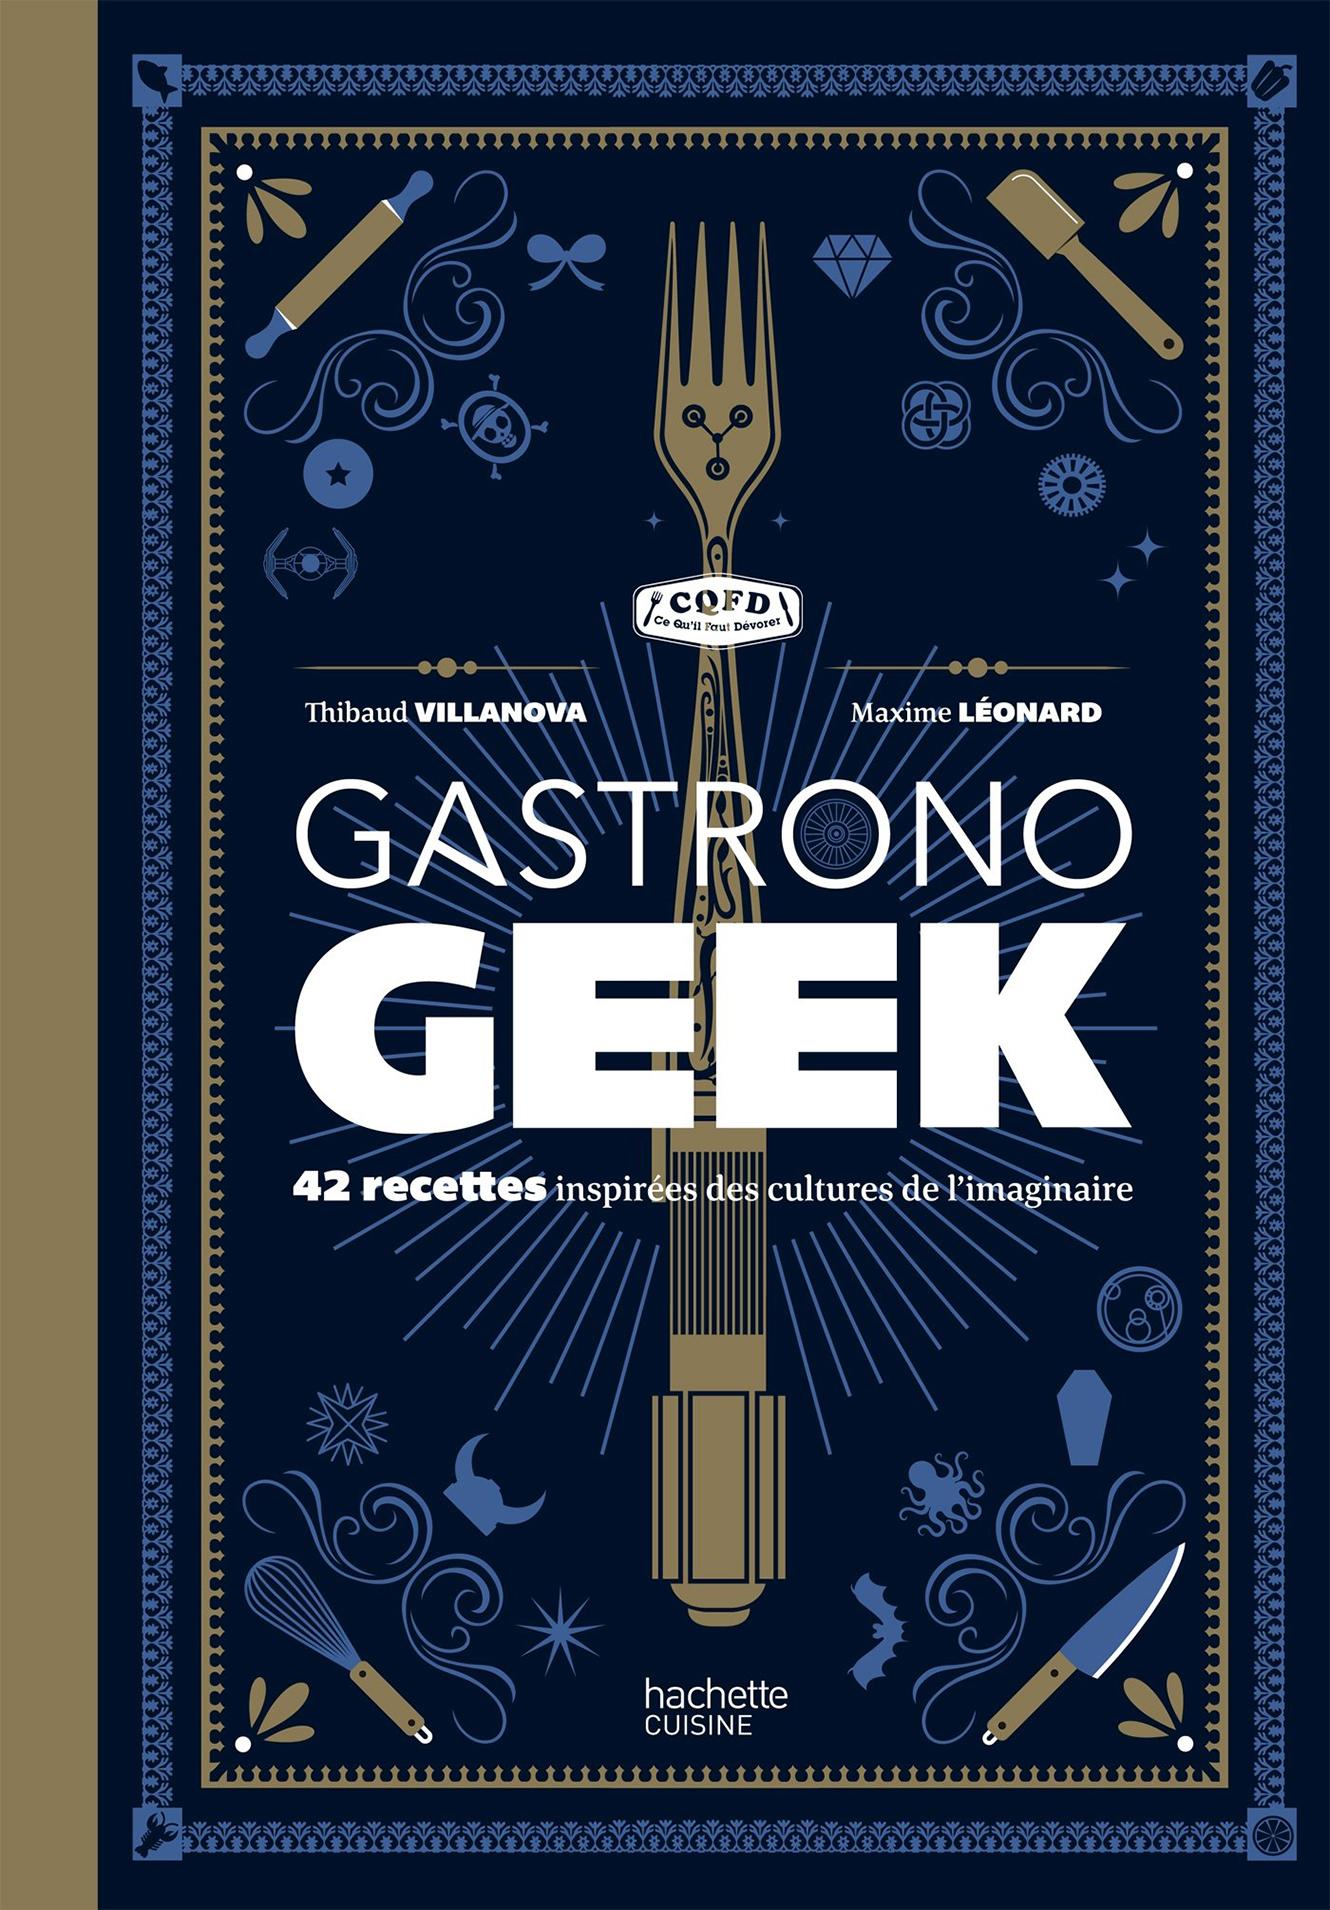 Calendrier Avent Geek.Calendrier De L Avent 2015 La Geekerie De Noel Gastronogeek